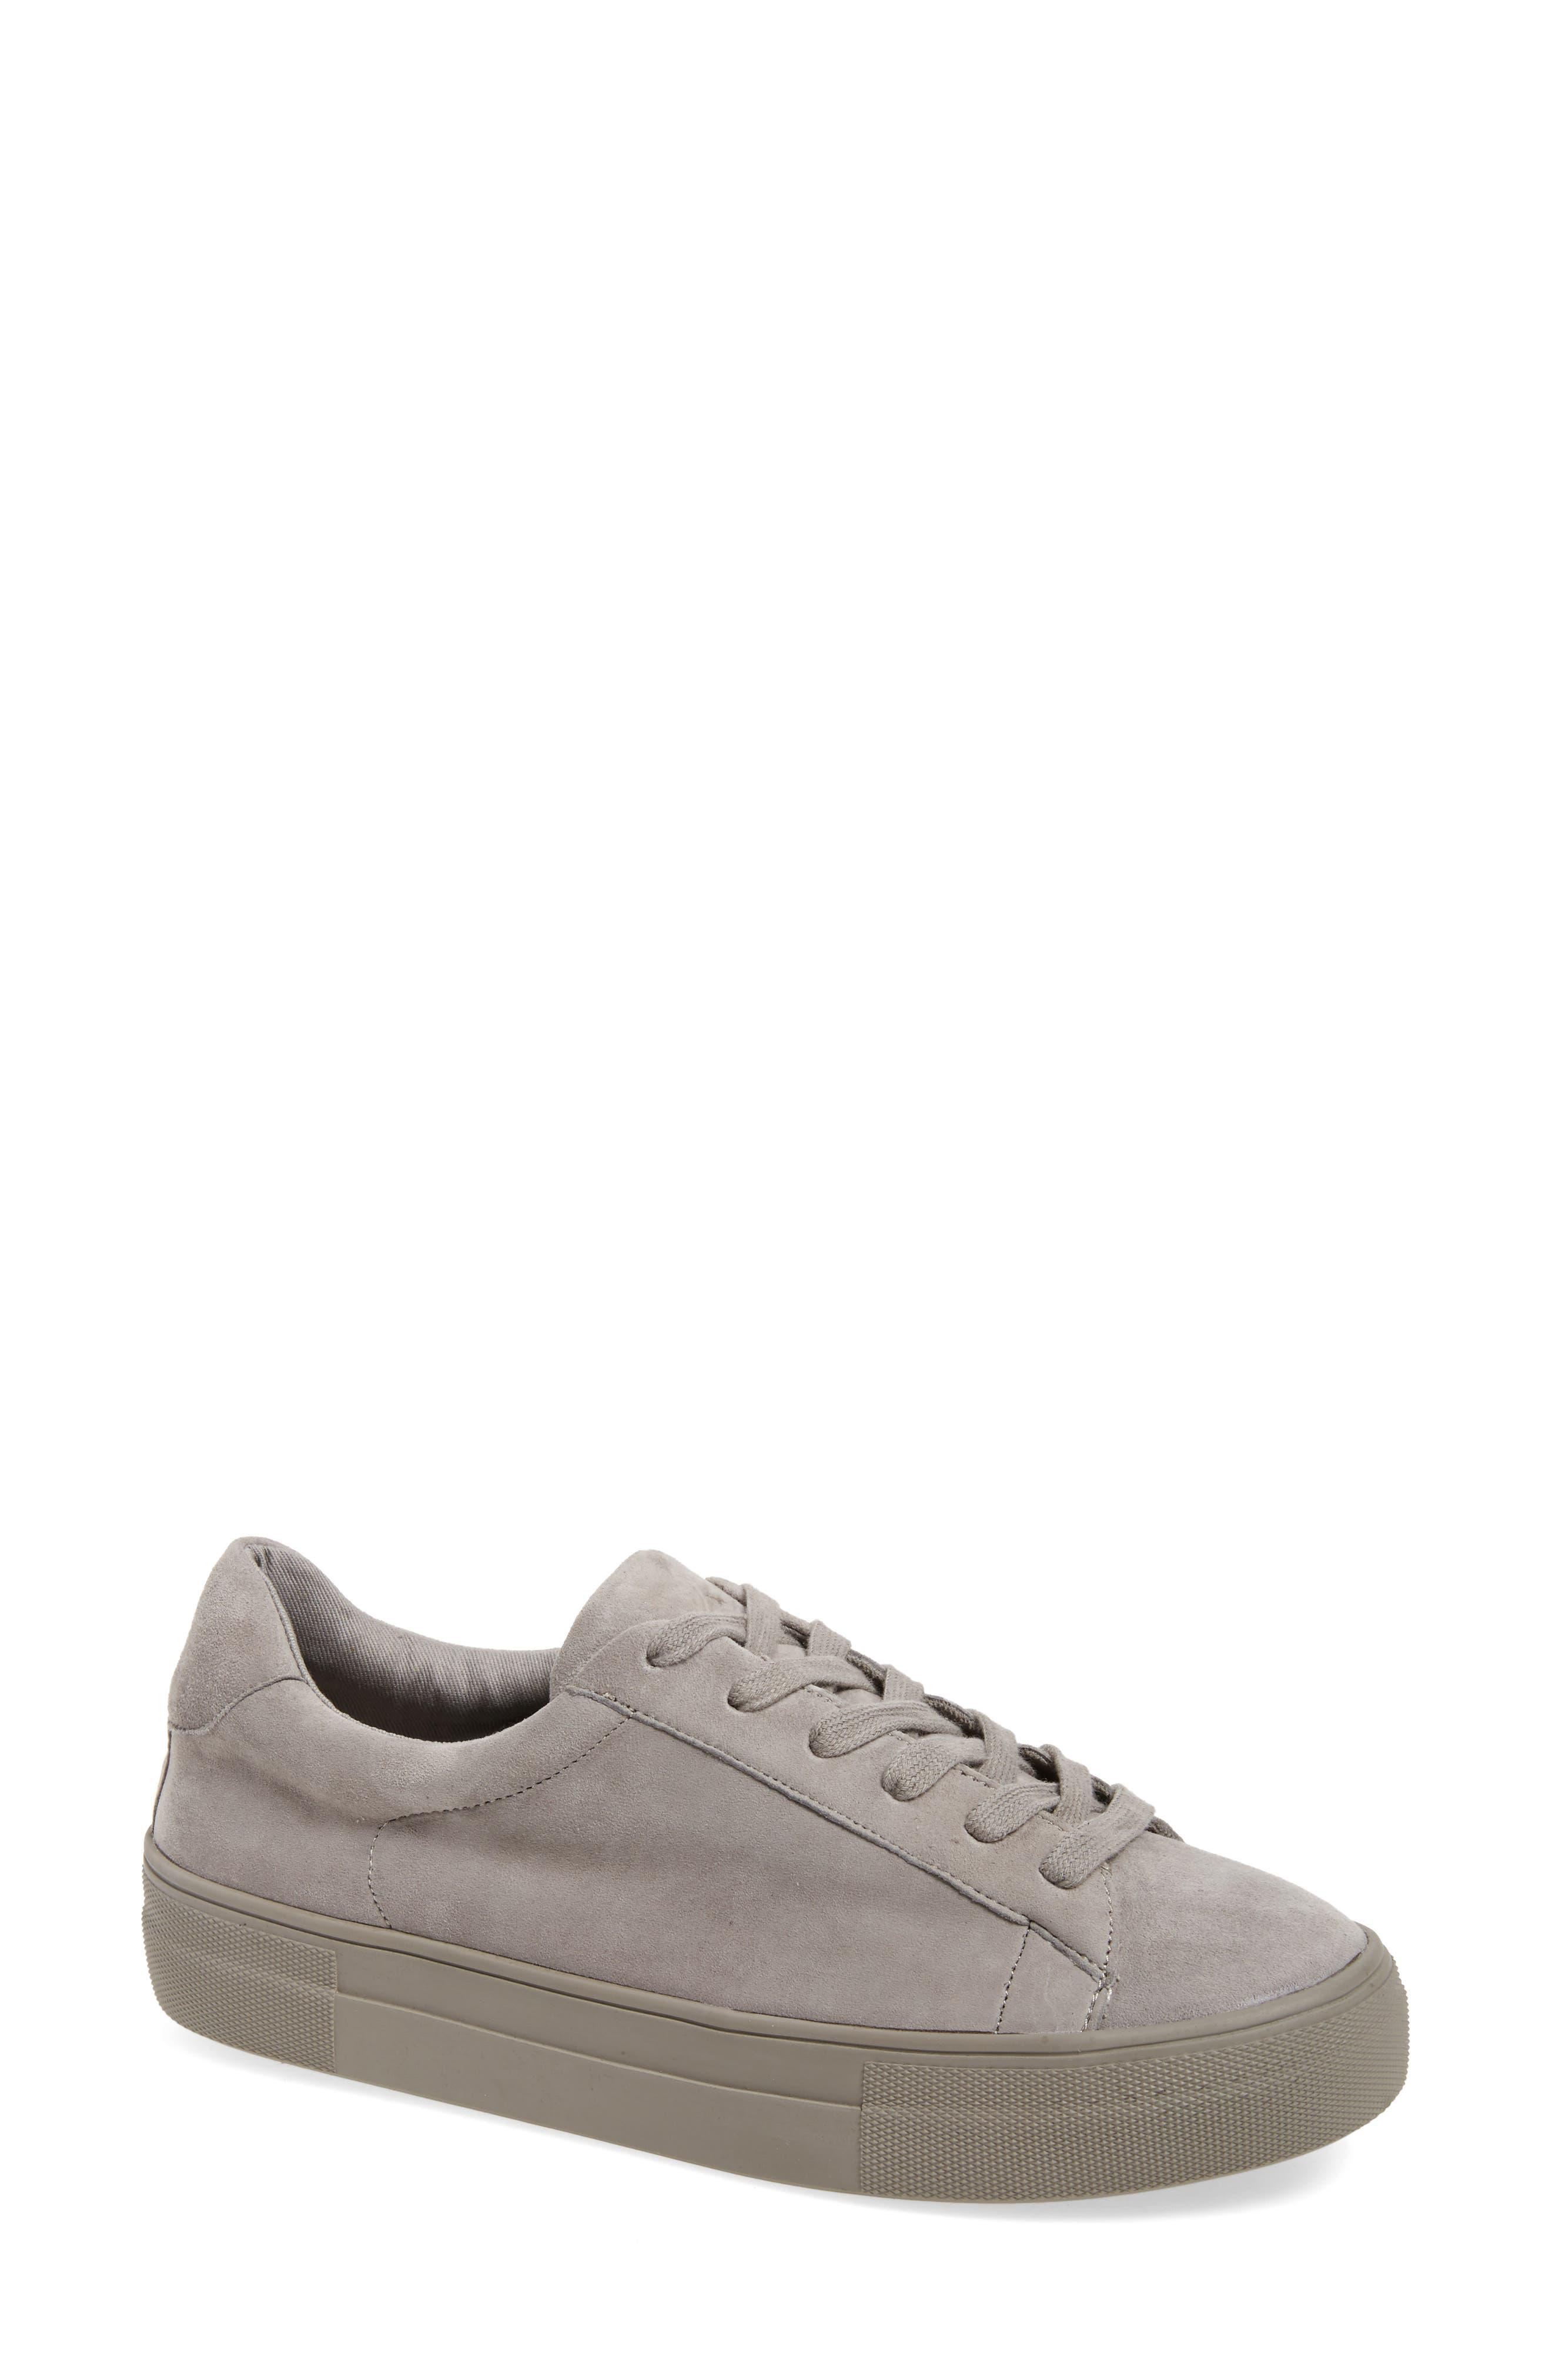 Gisela Low Top Sneaker,                             Main thumbnail 1, color,                             020